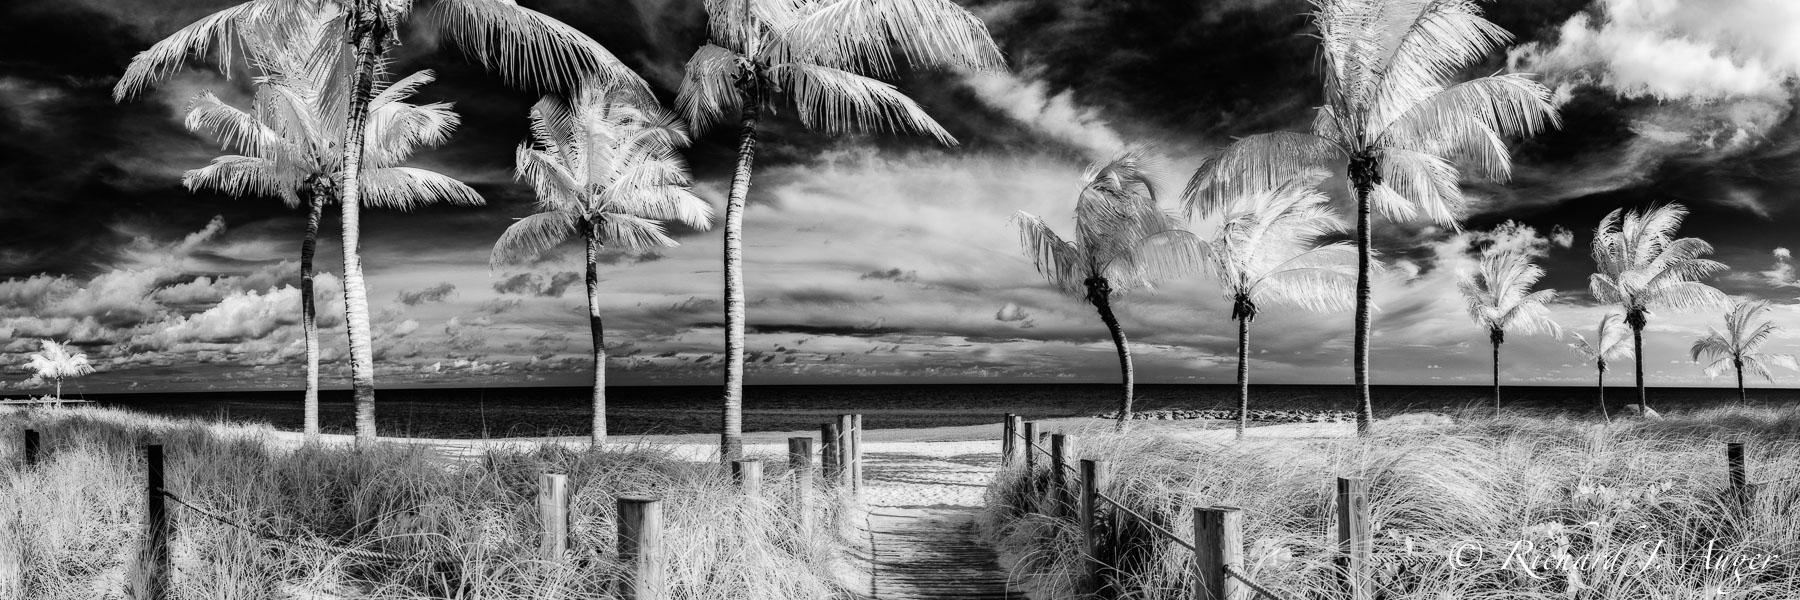 Smathers Beach, Key West, Florida, Palm Trees, Monochrome, Black and White, Beach, Ocean, Paradise, Photograph, Landscape